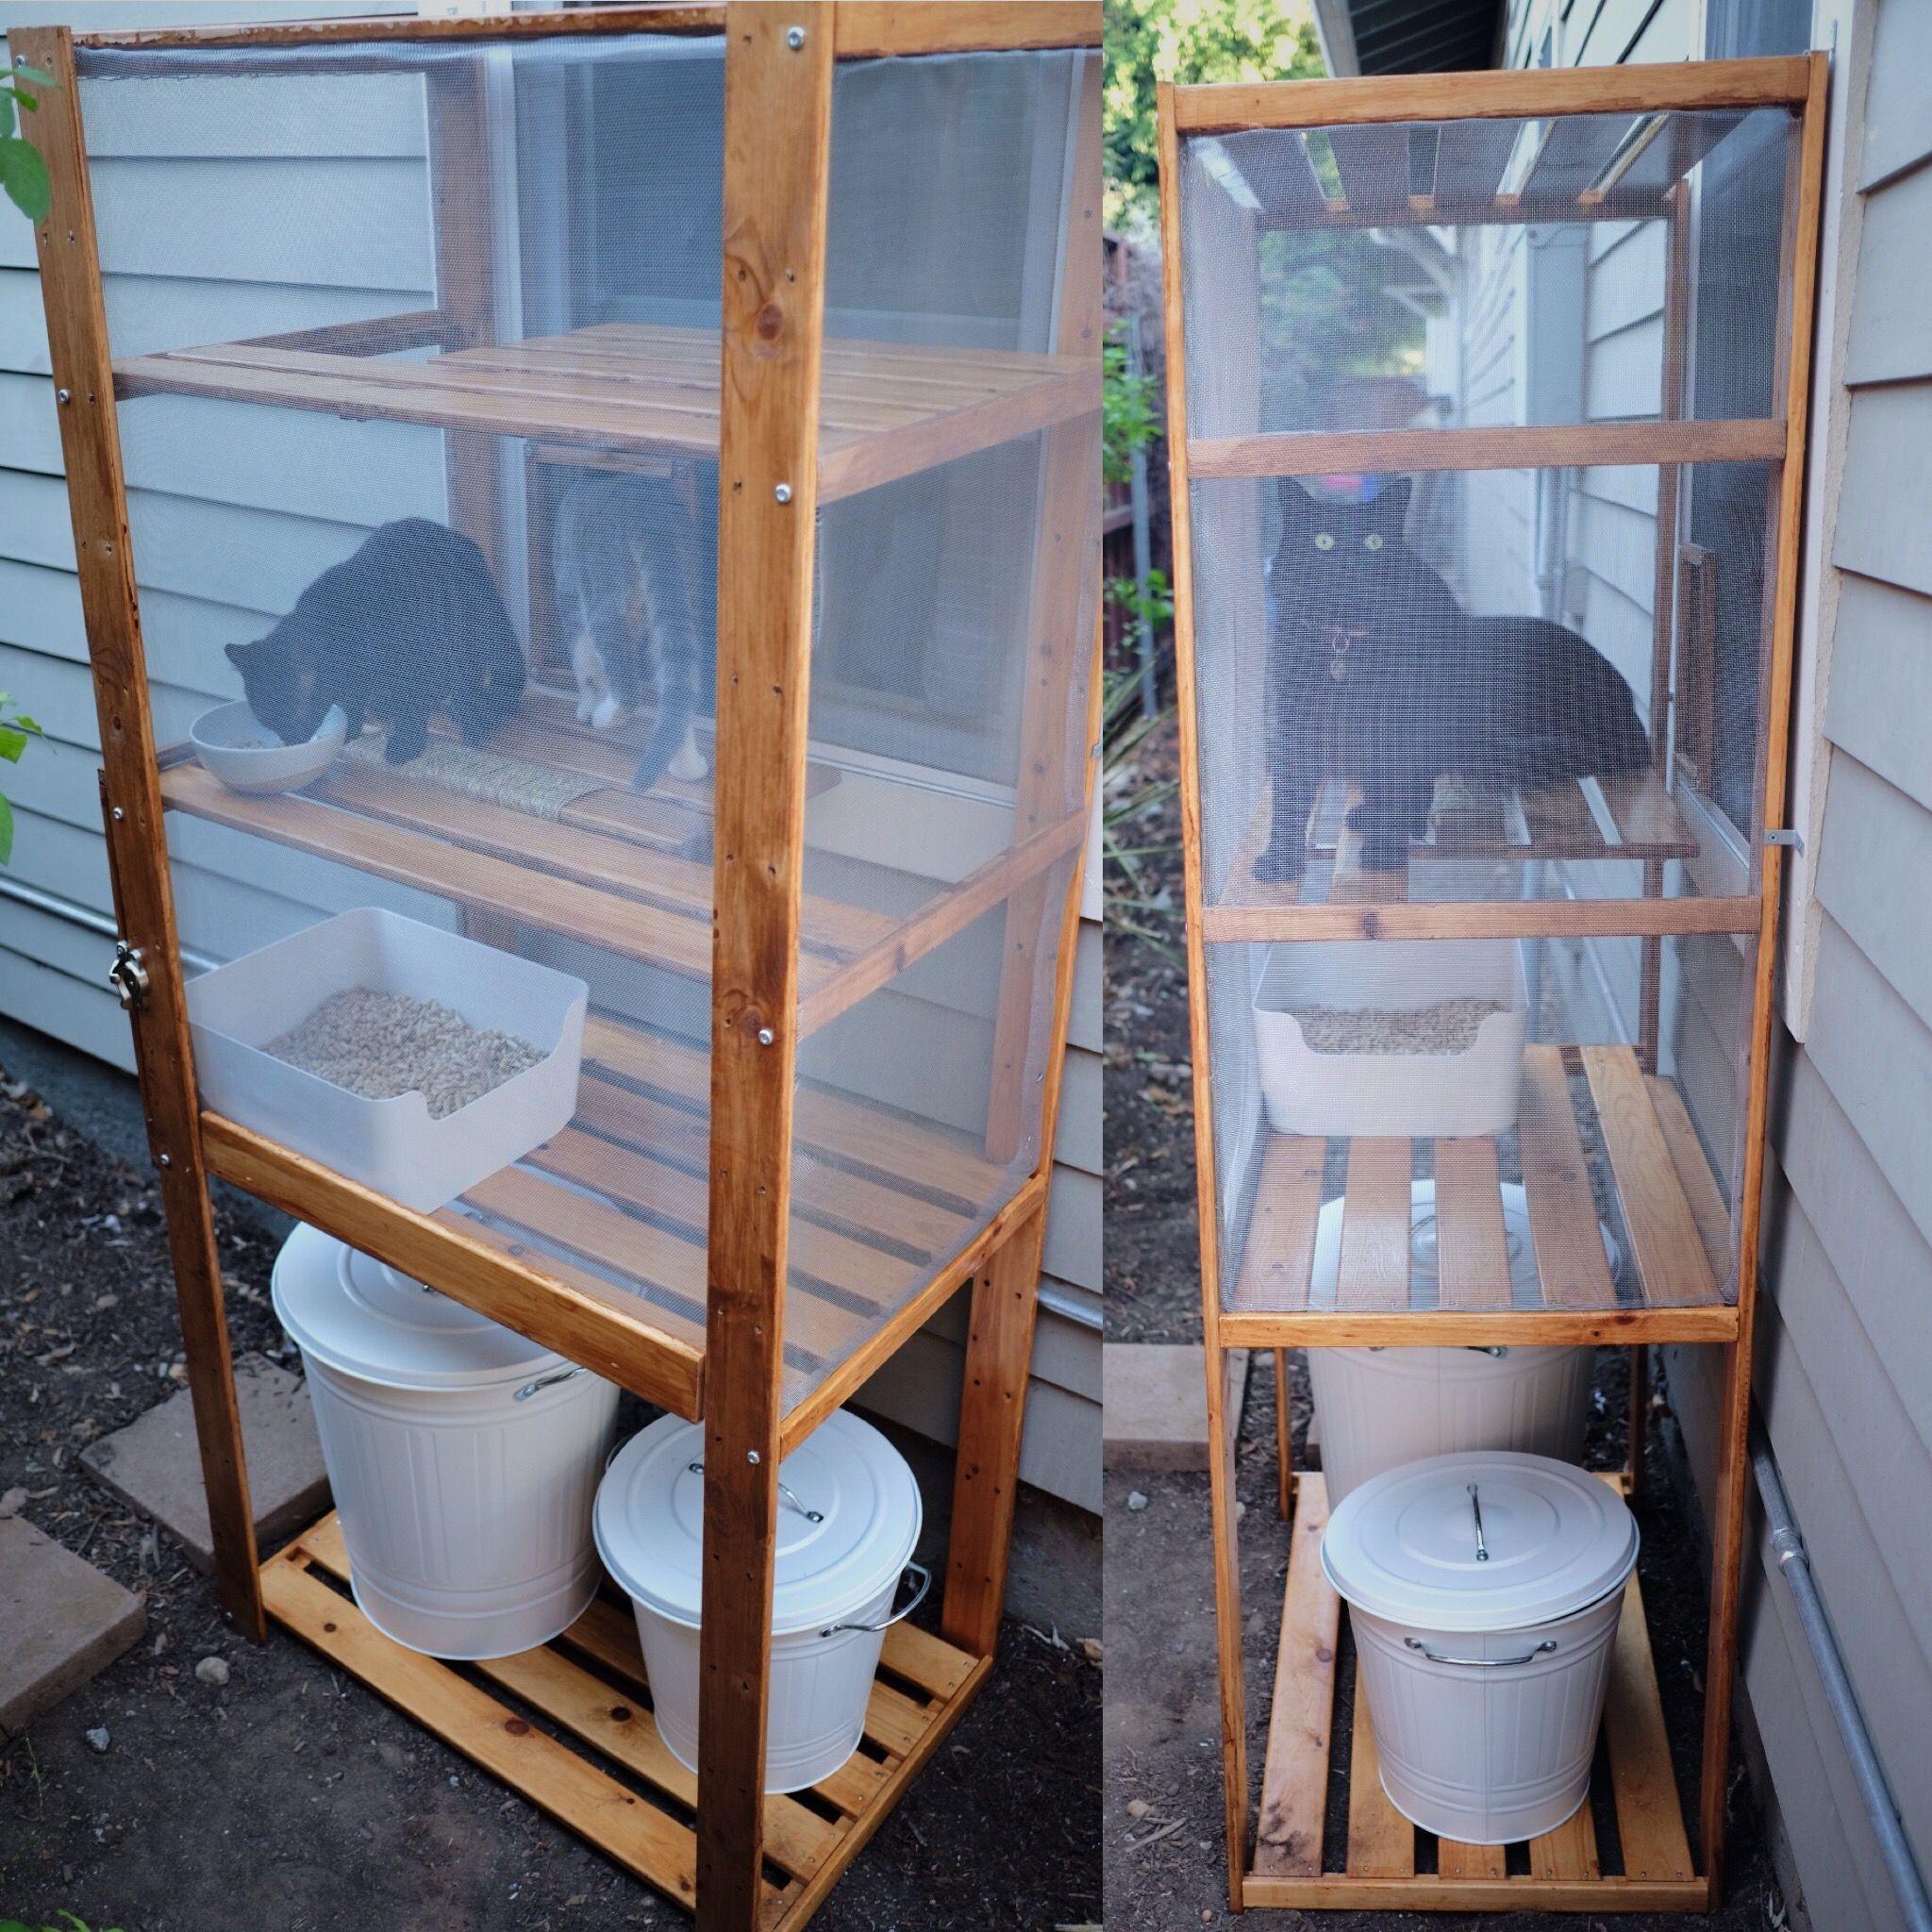 diy outdoor cat litter box/ catio made using an ikea hejne shelf